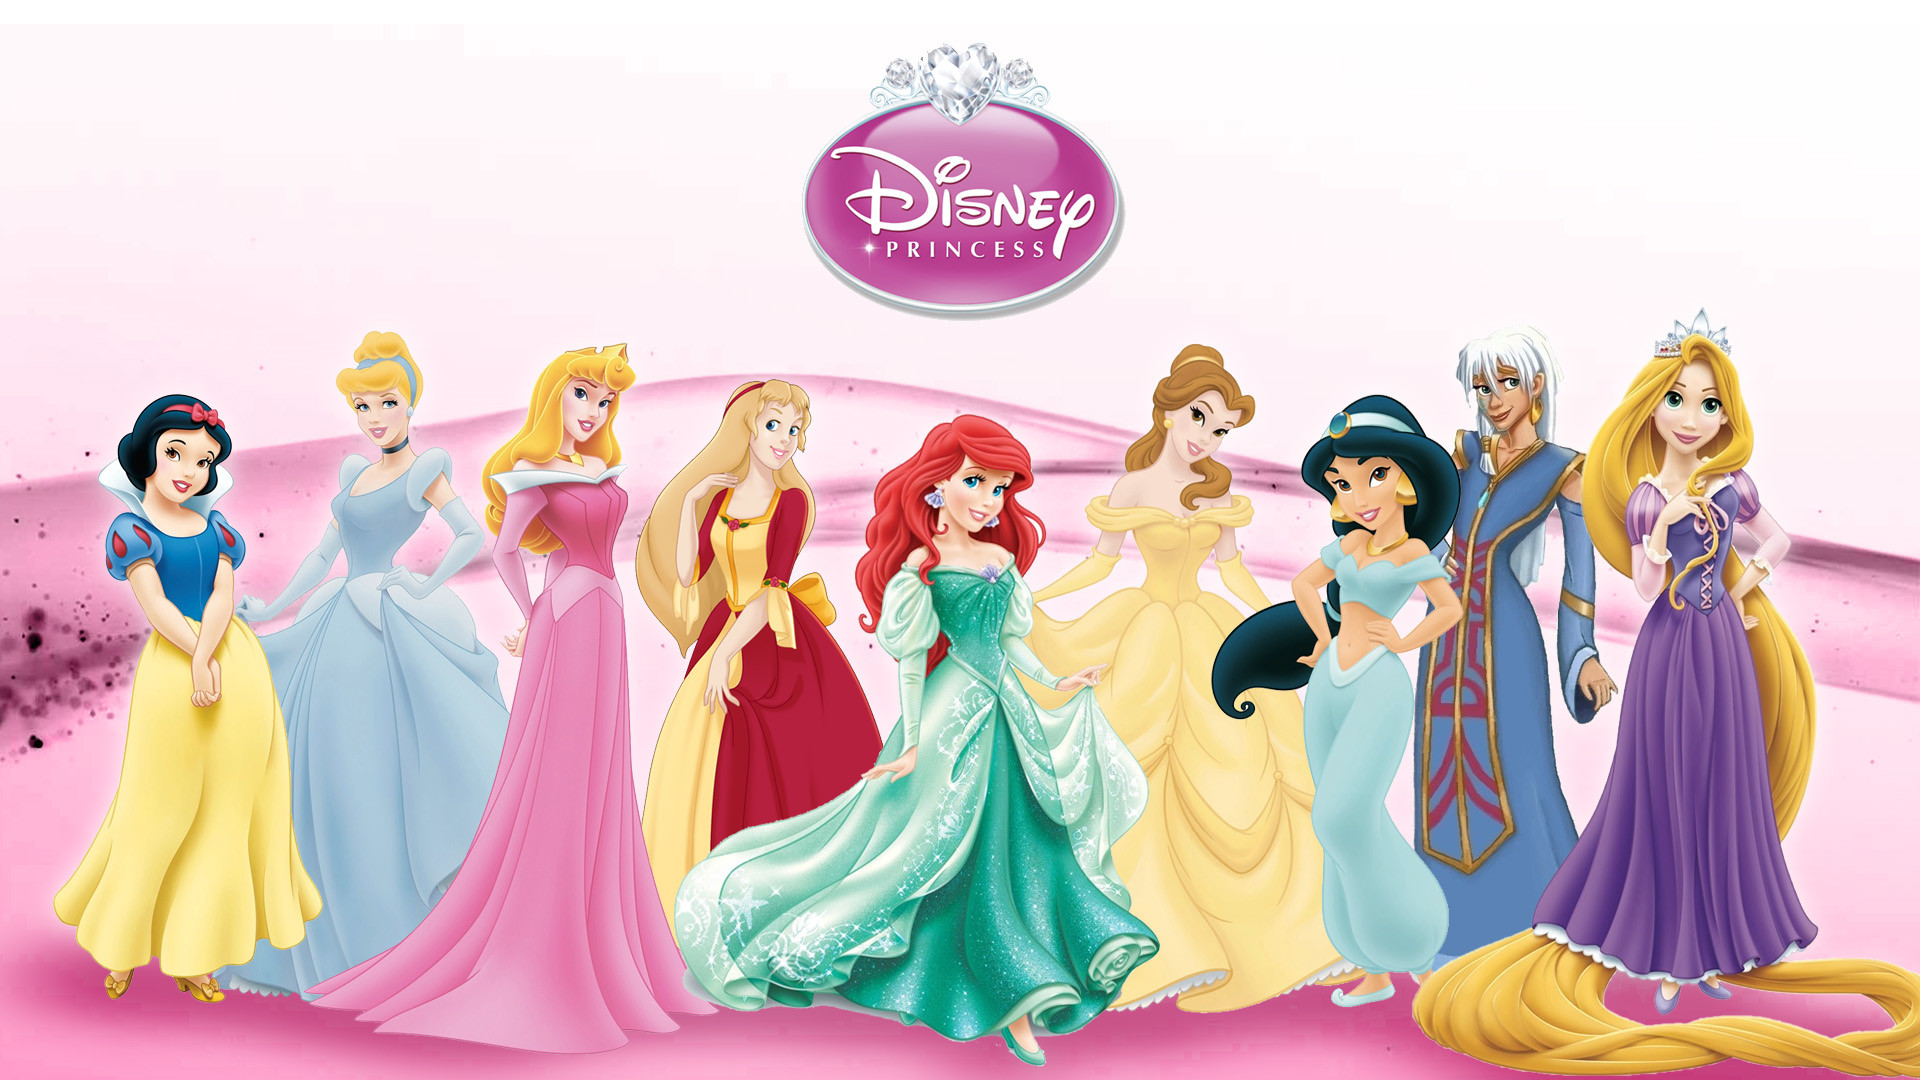 Disney Princesses Wallpaper ①